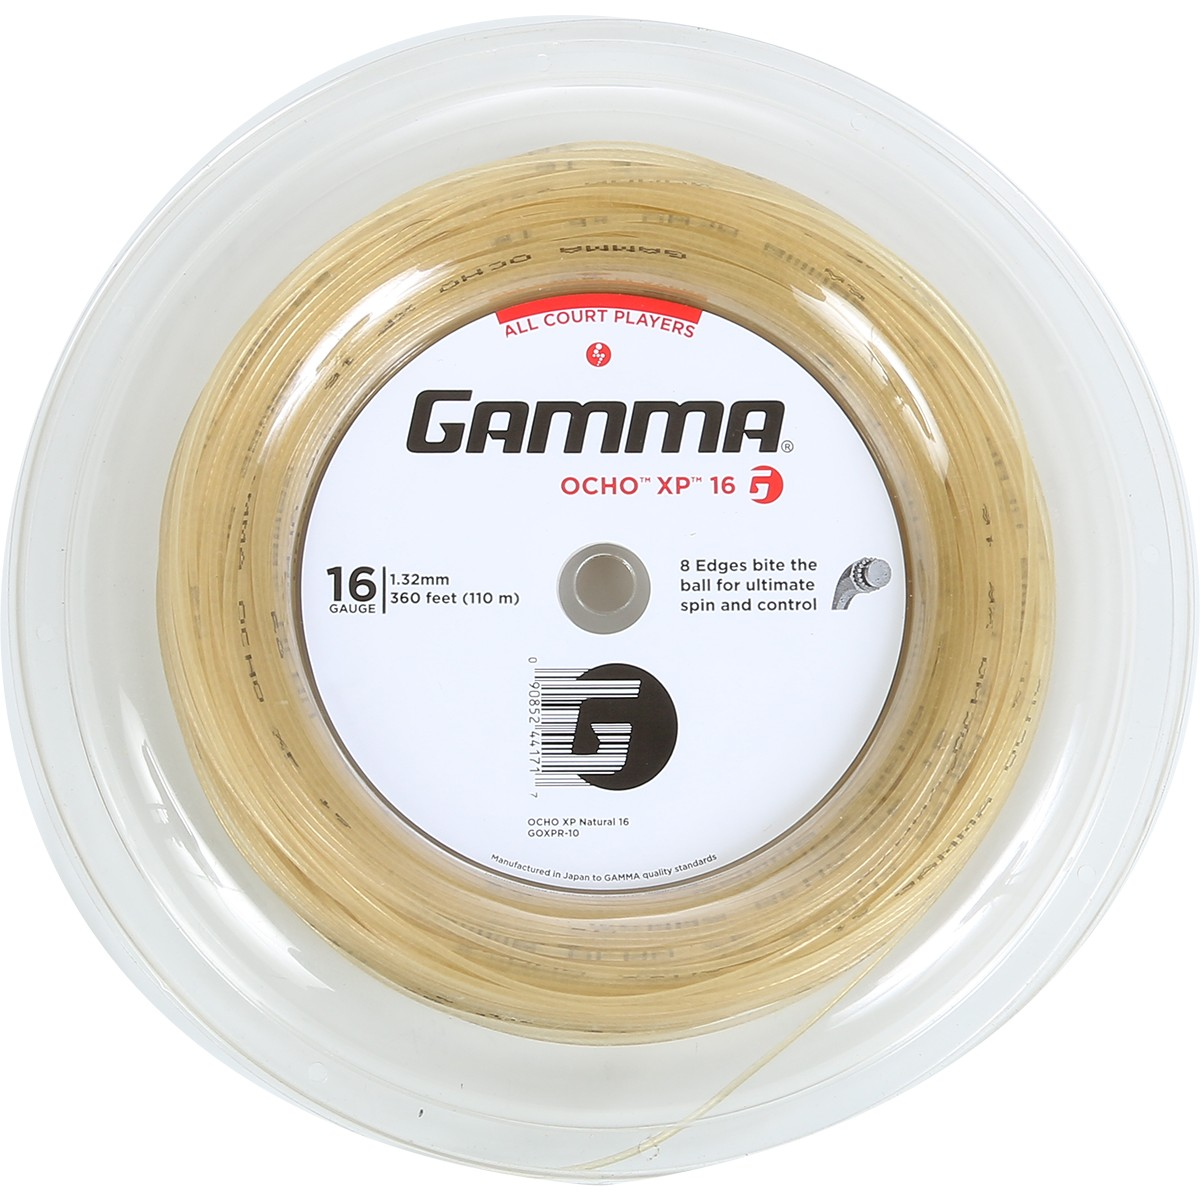 GAMMA OCHO XP (ROL 110M)